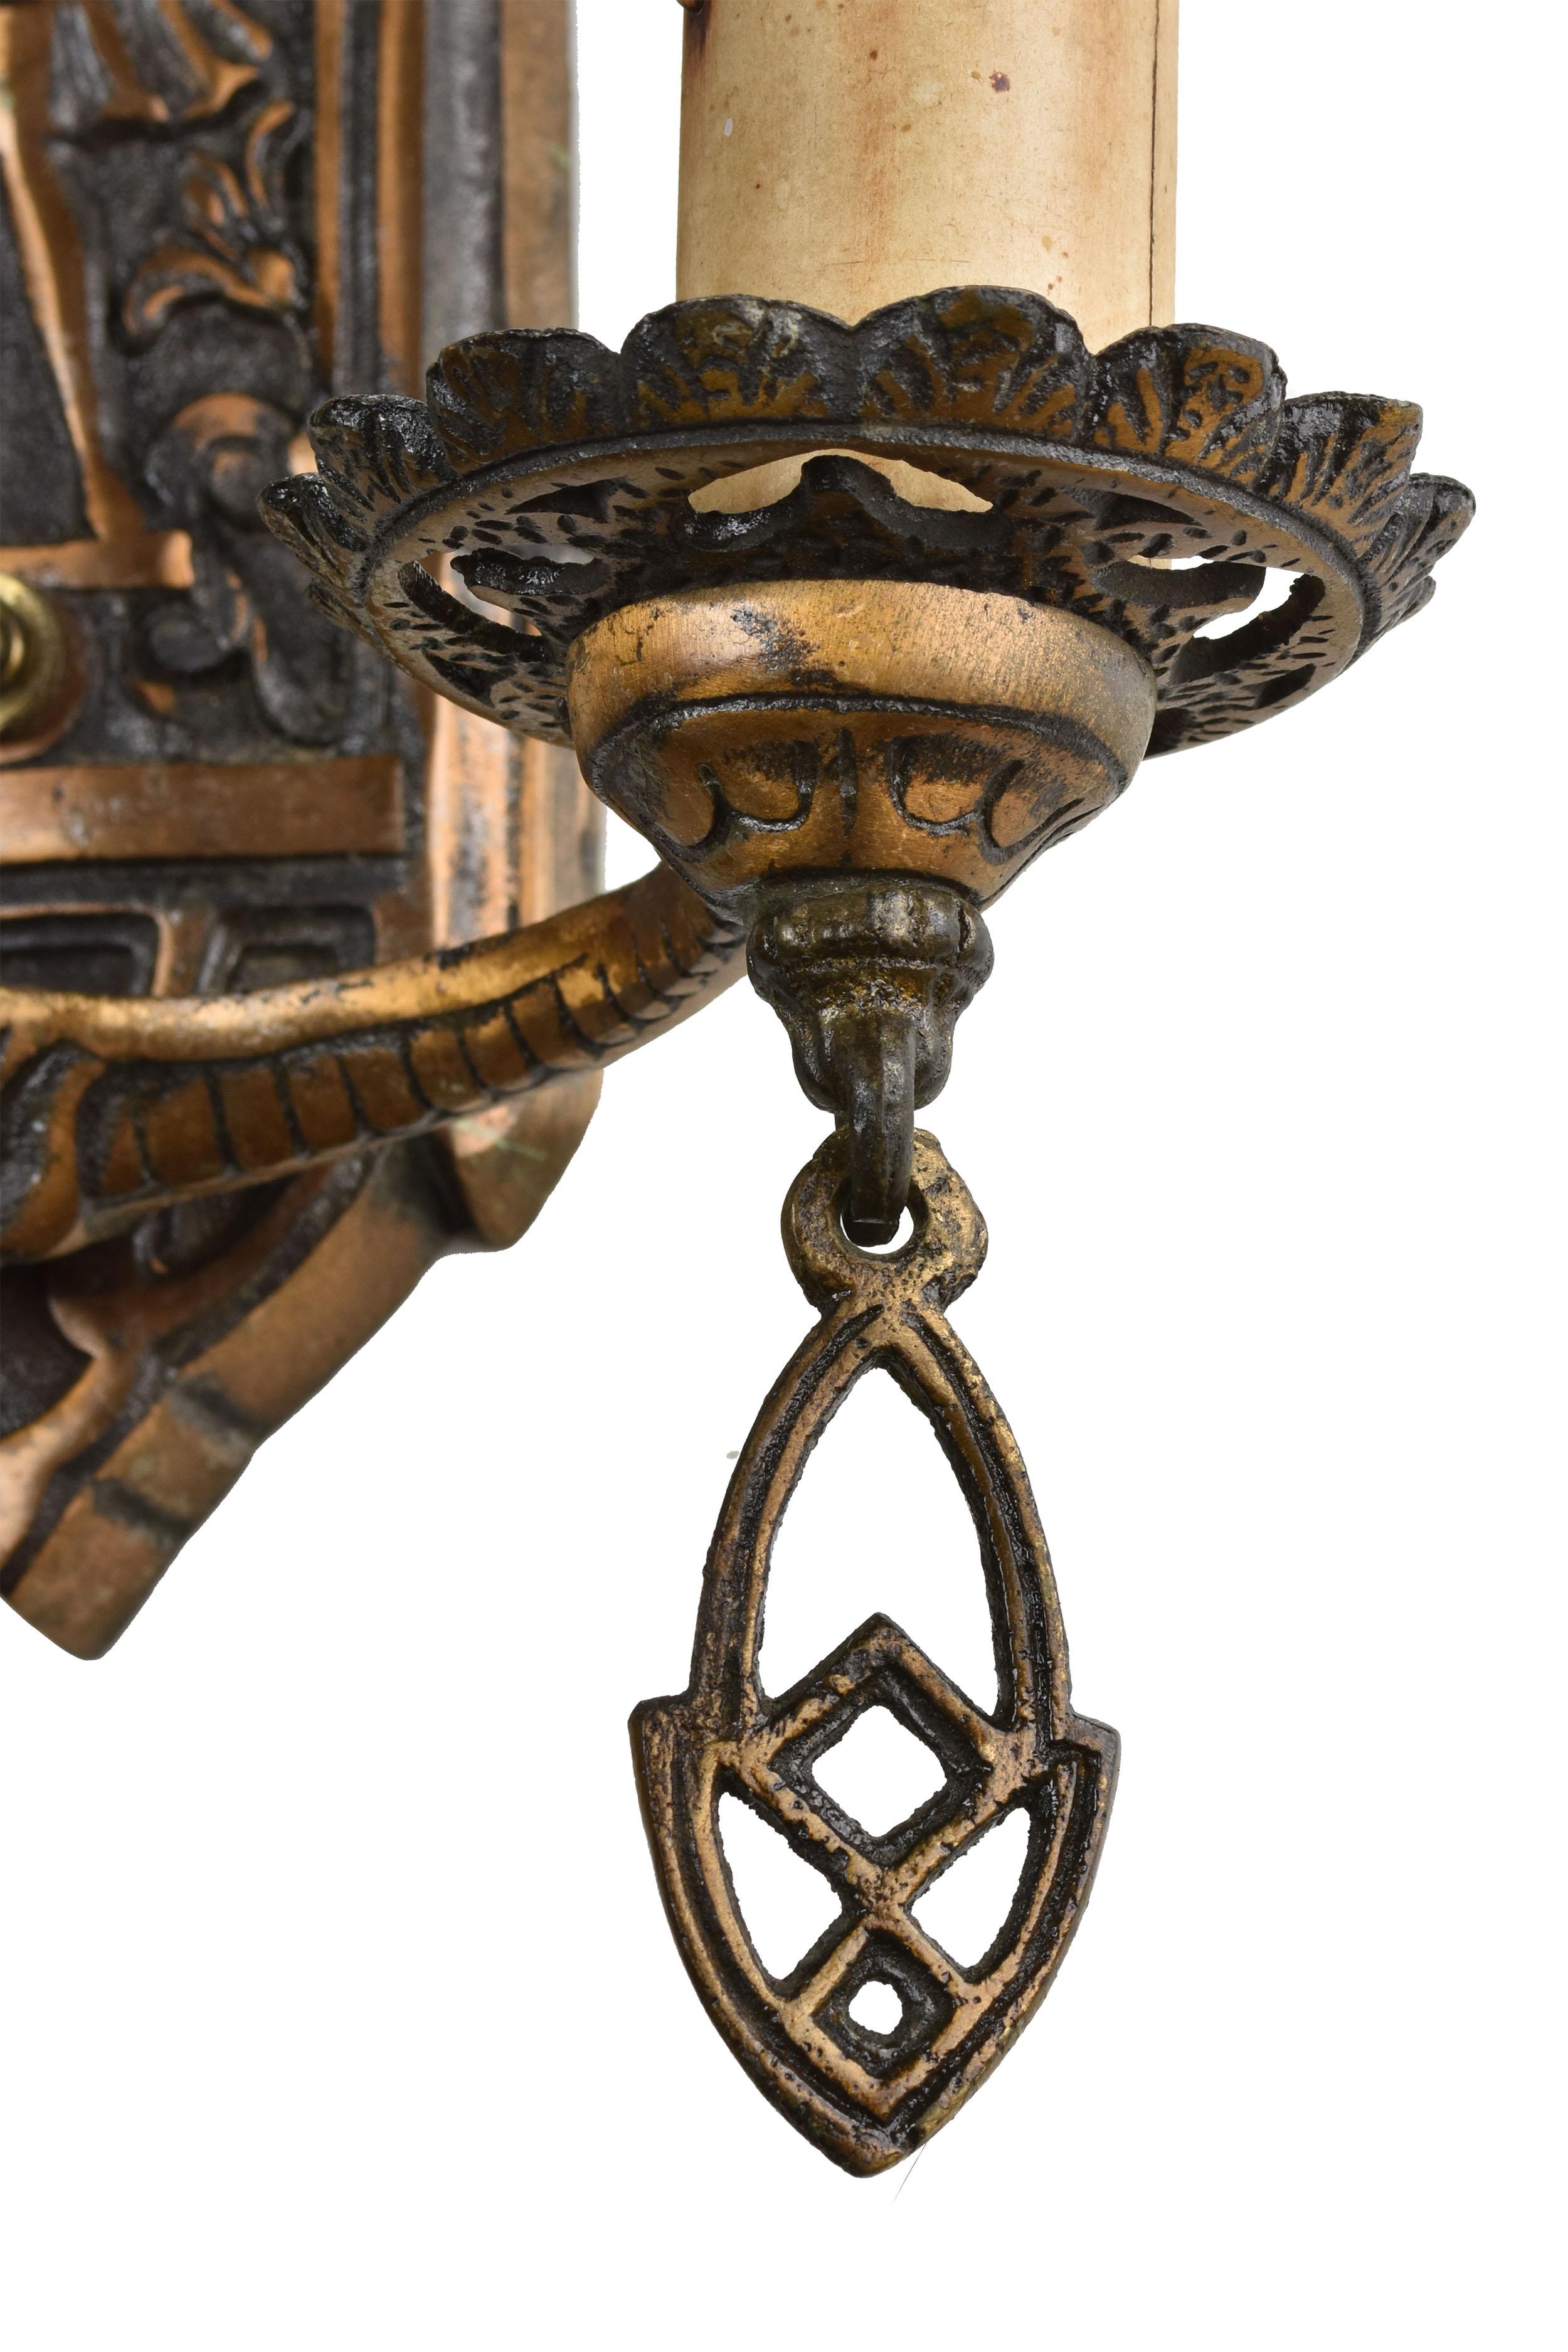 48425 double candle bronze archer sconce tassle.jpg